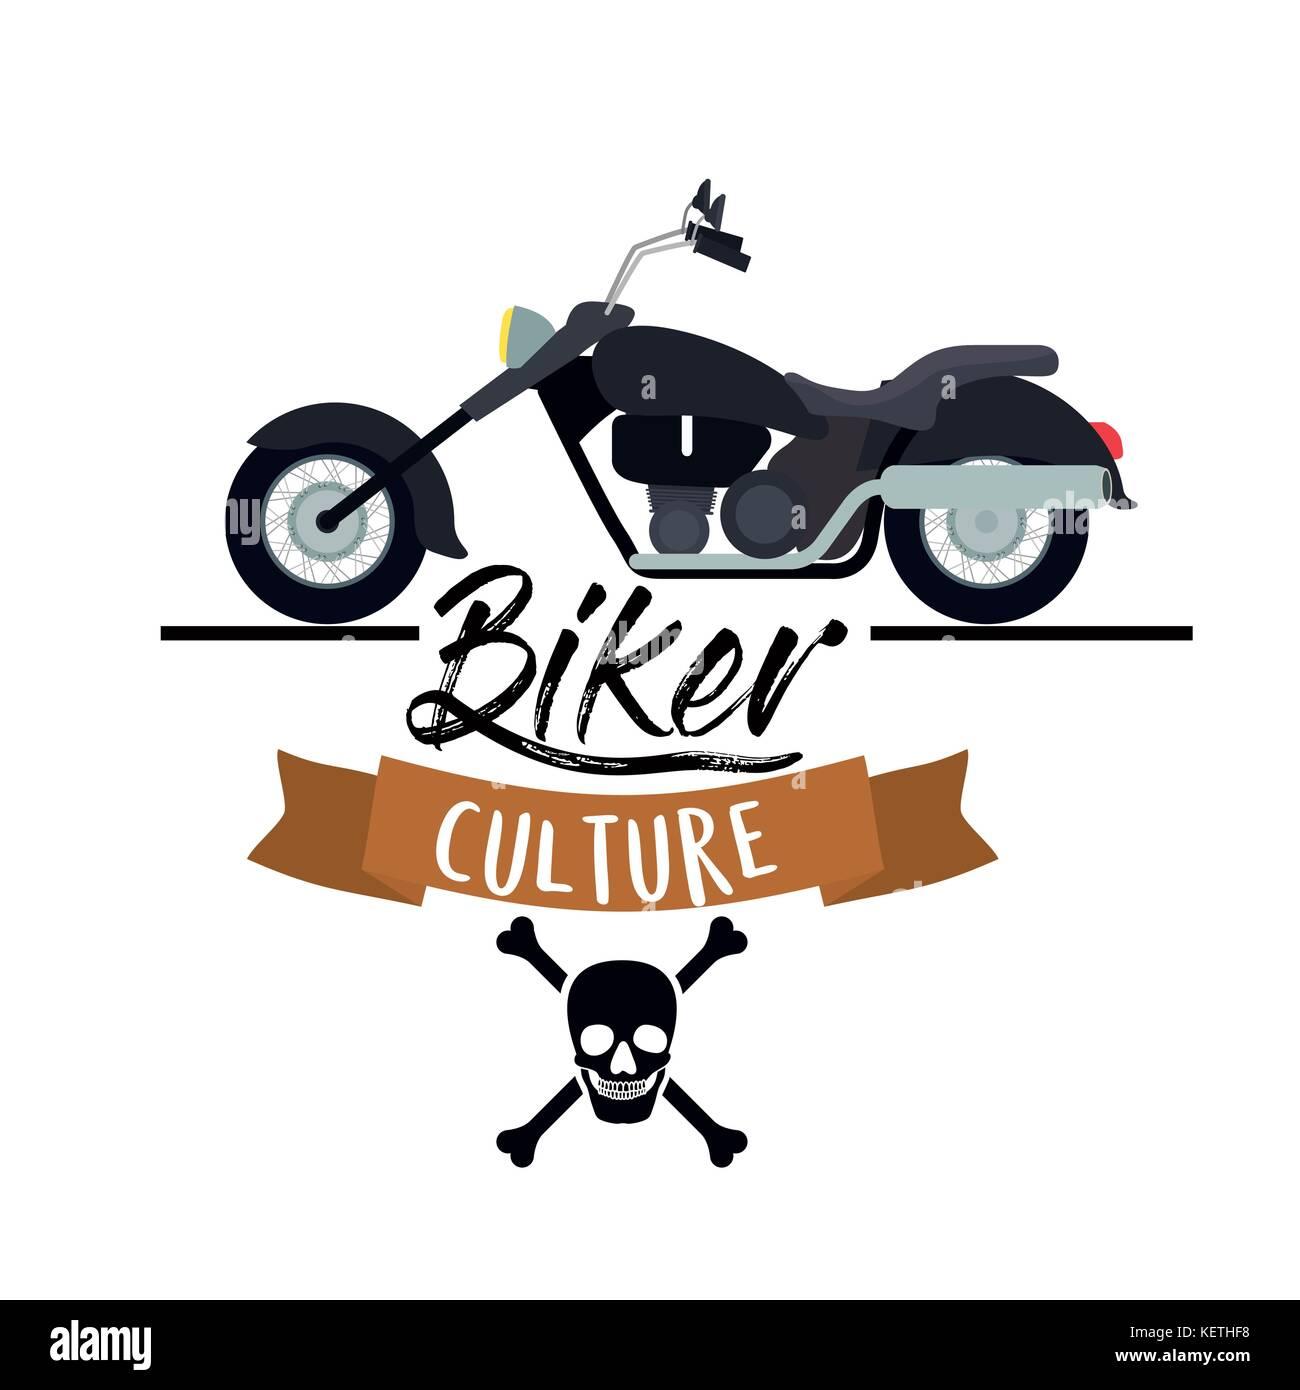 Symbol Of Motor Biker Stock Photos & Symbol Of Motor Biker Stock ...